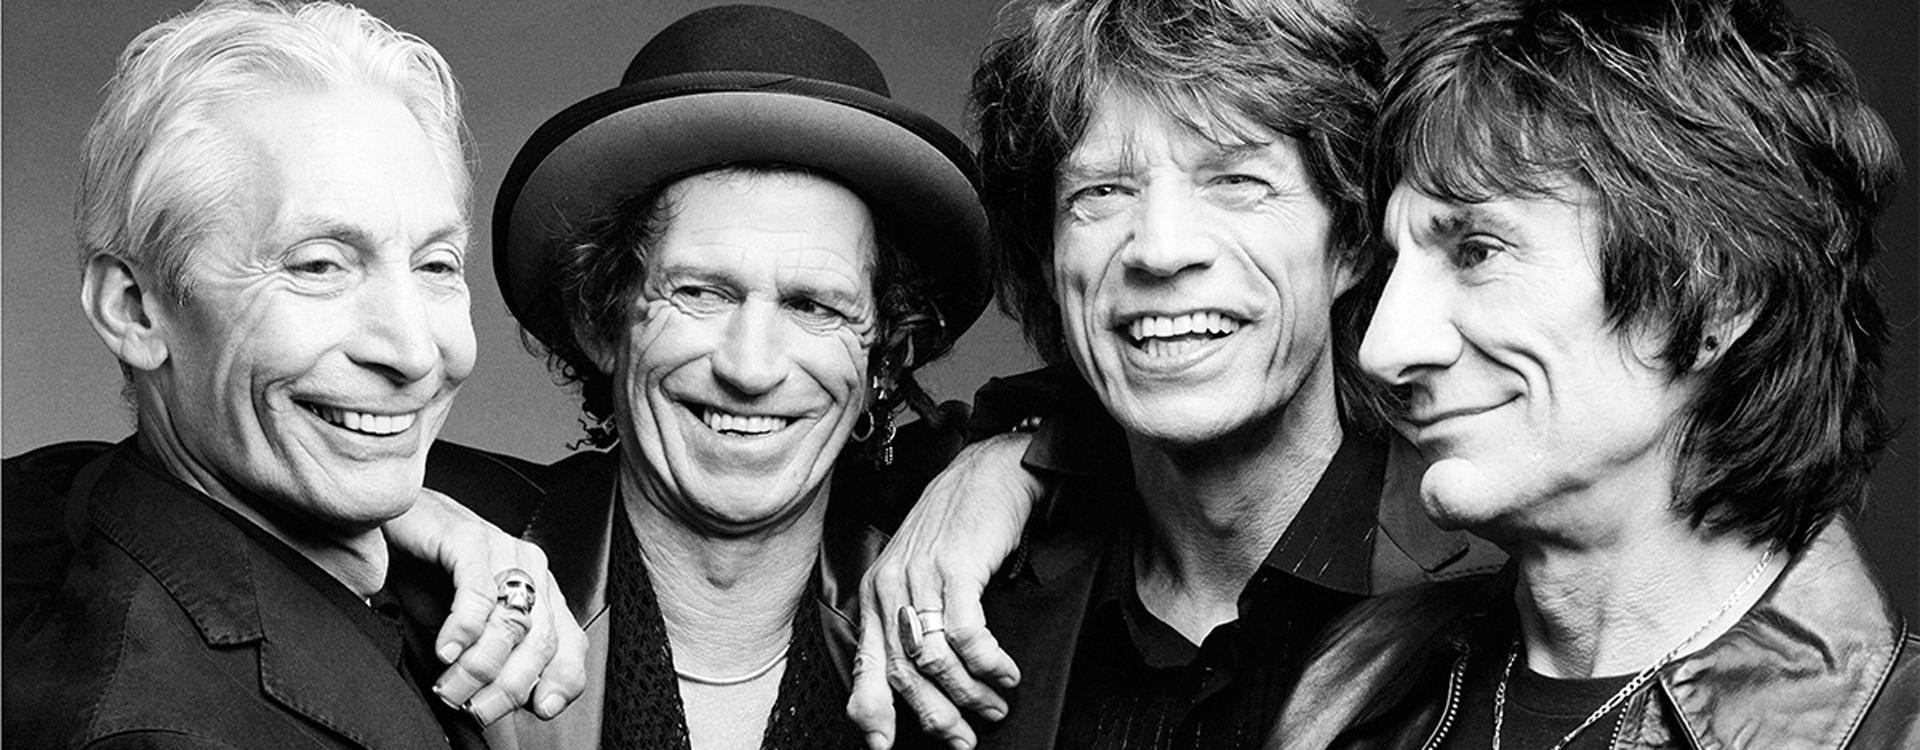 The Rolling Stones to Headline 'Concert of the Century